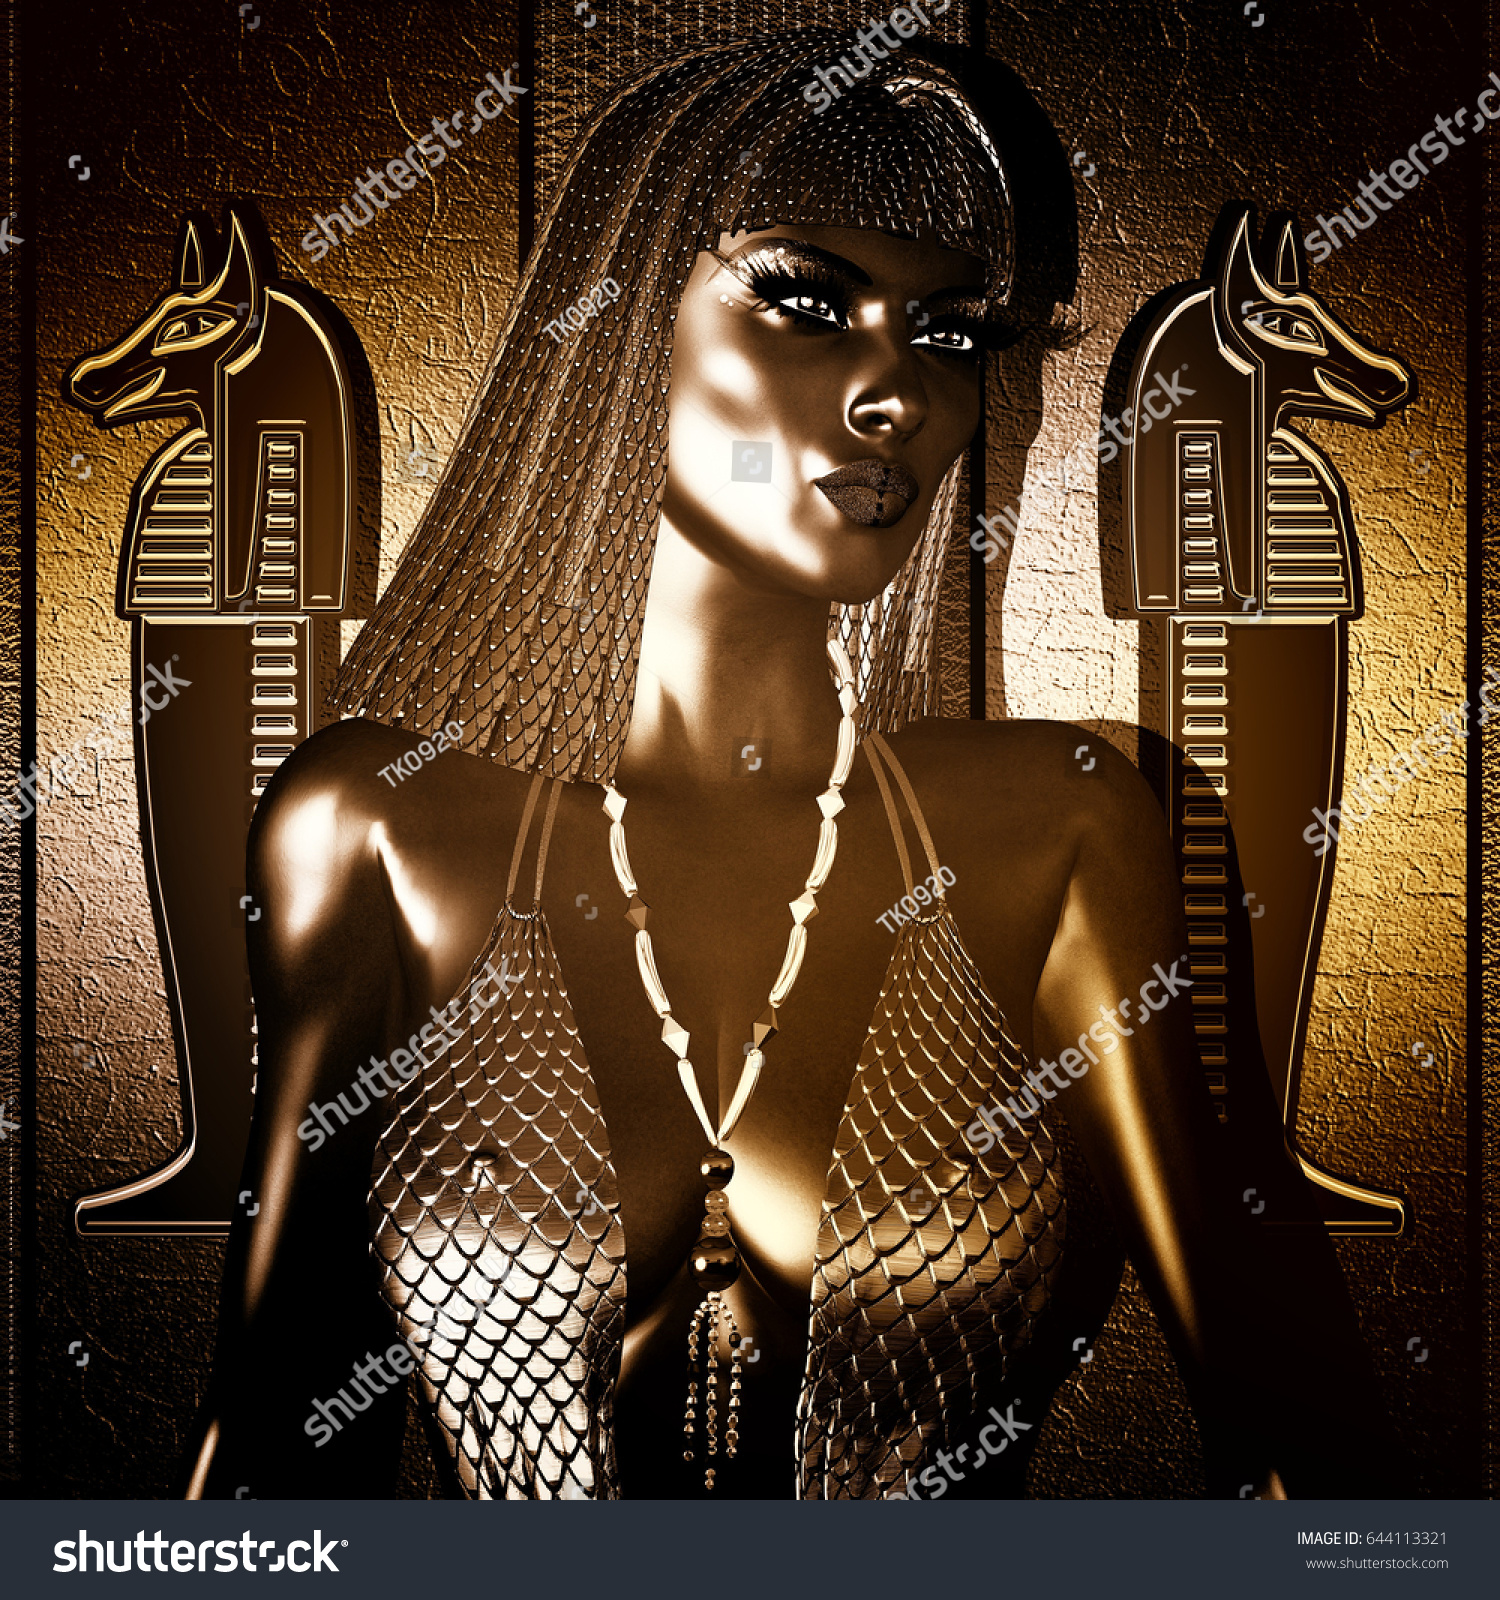 Egyptian goddess nude Nude Photos 97